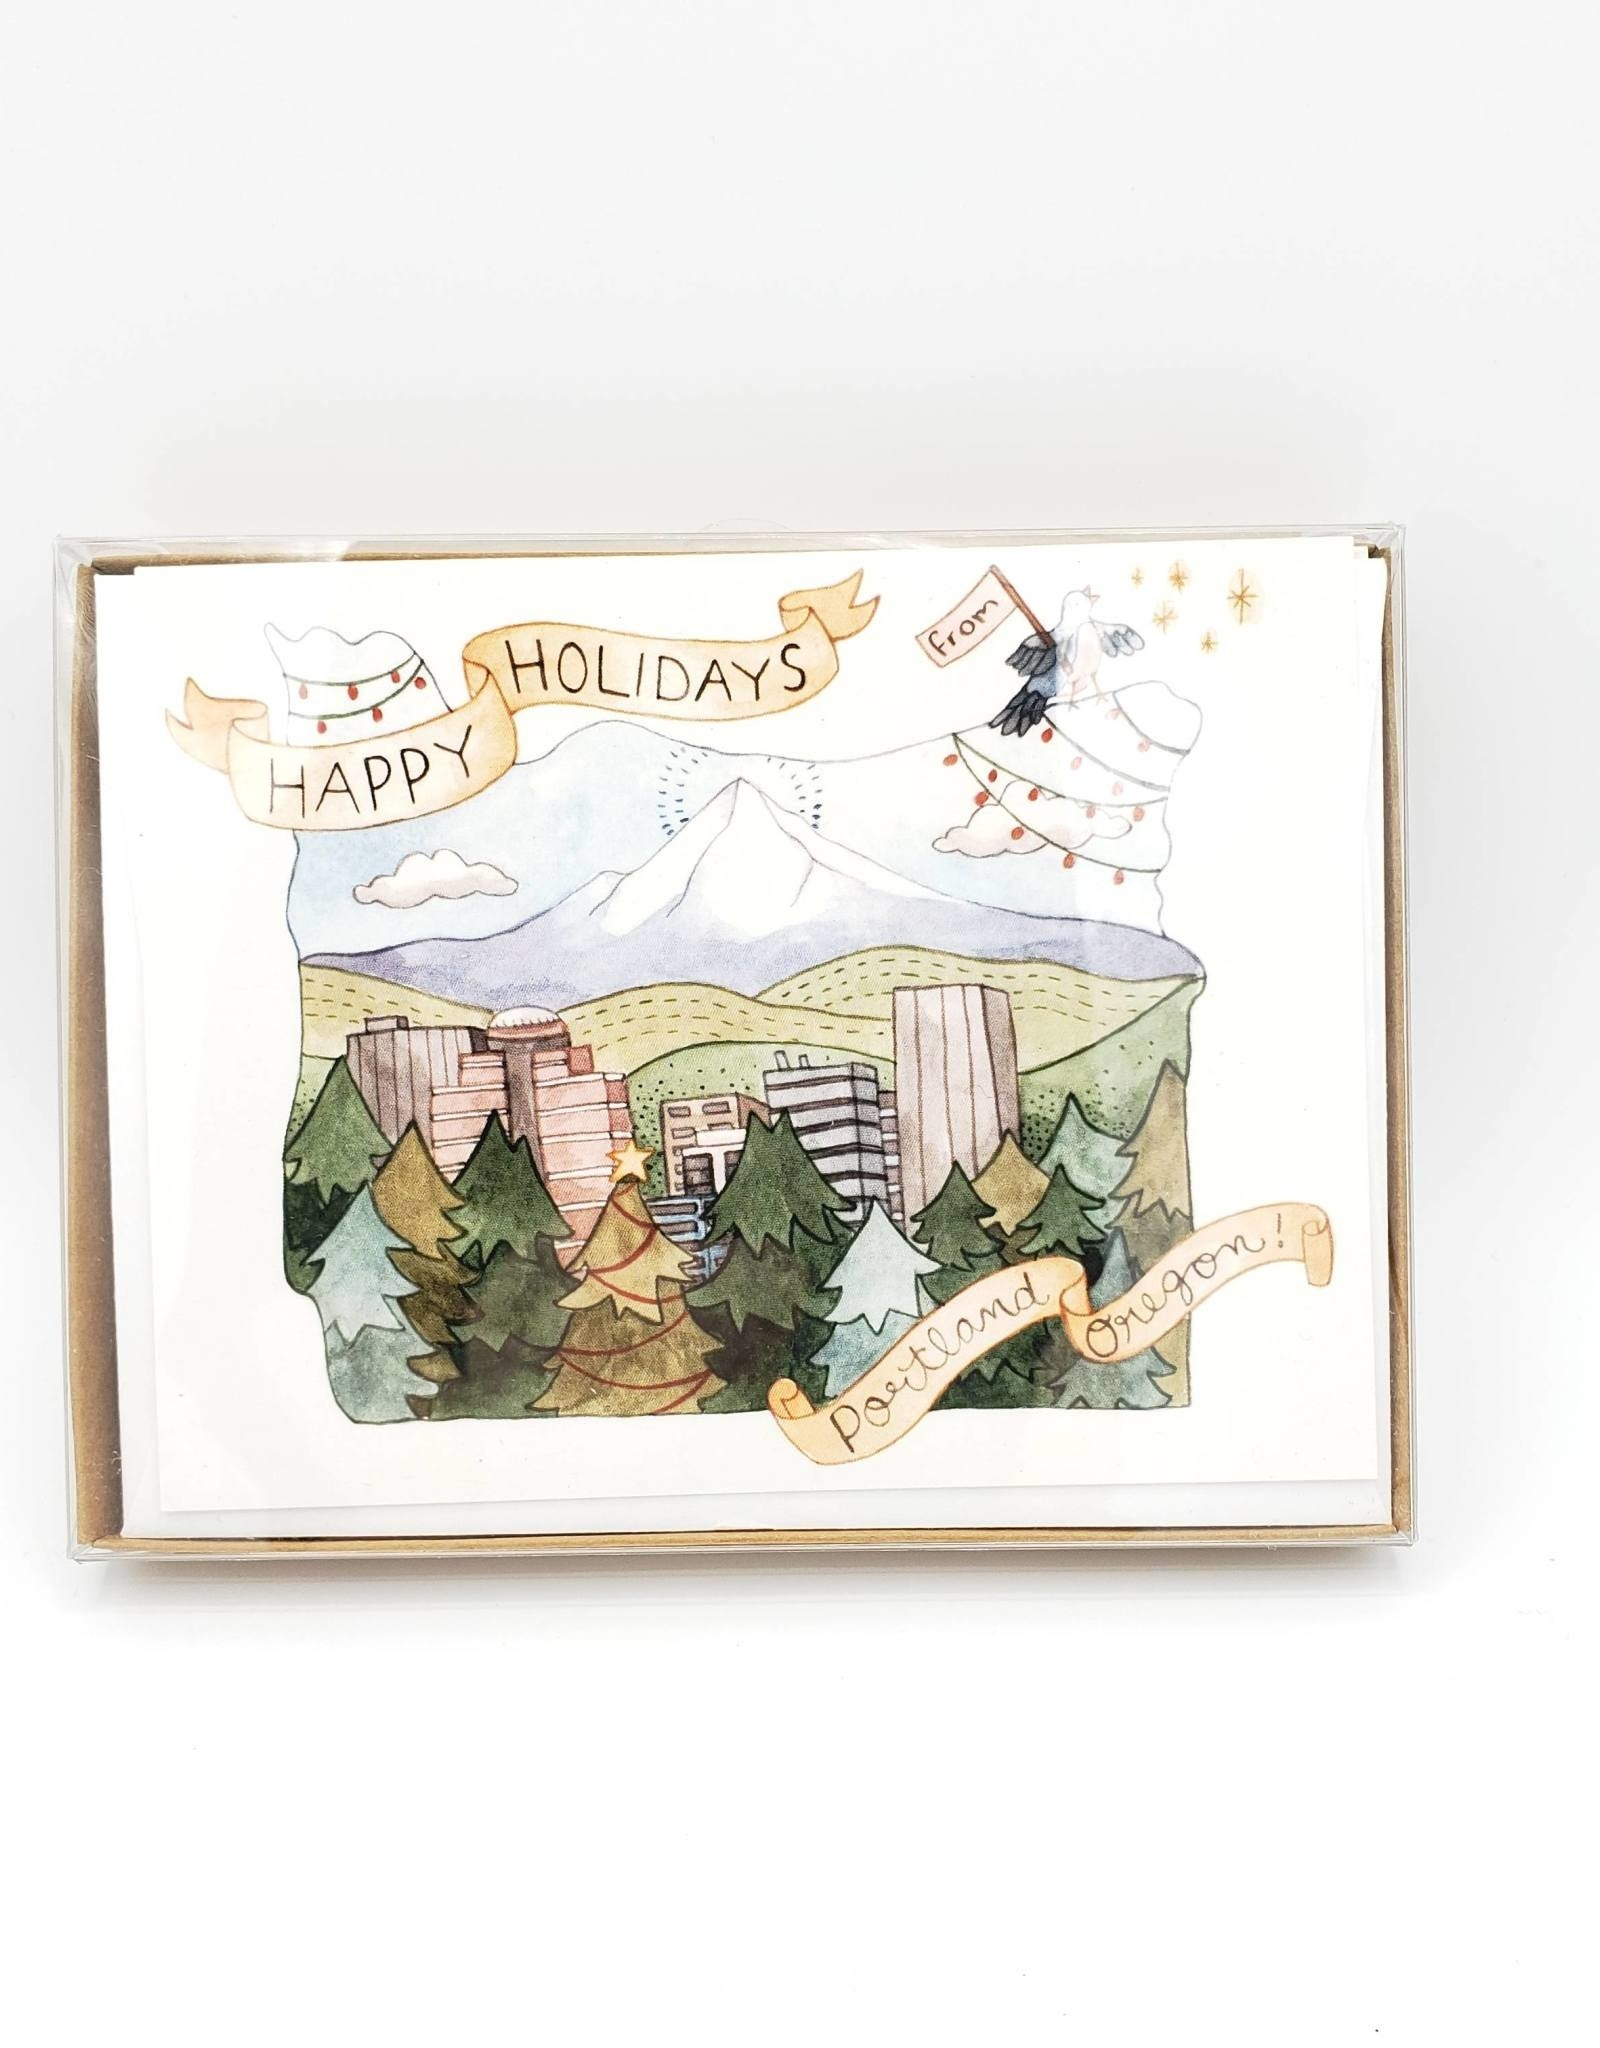 Happy Holidays Portland Greeting Card Box Set - Little Canoe